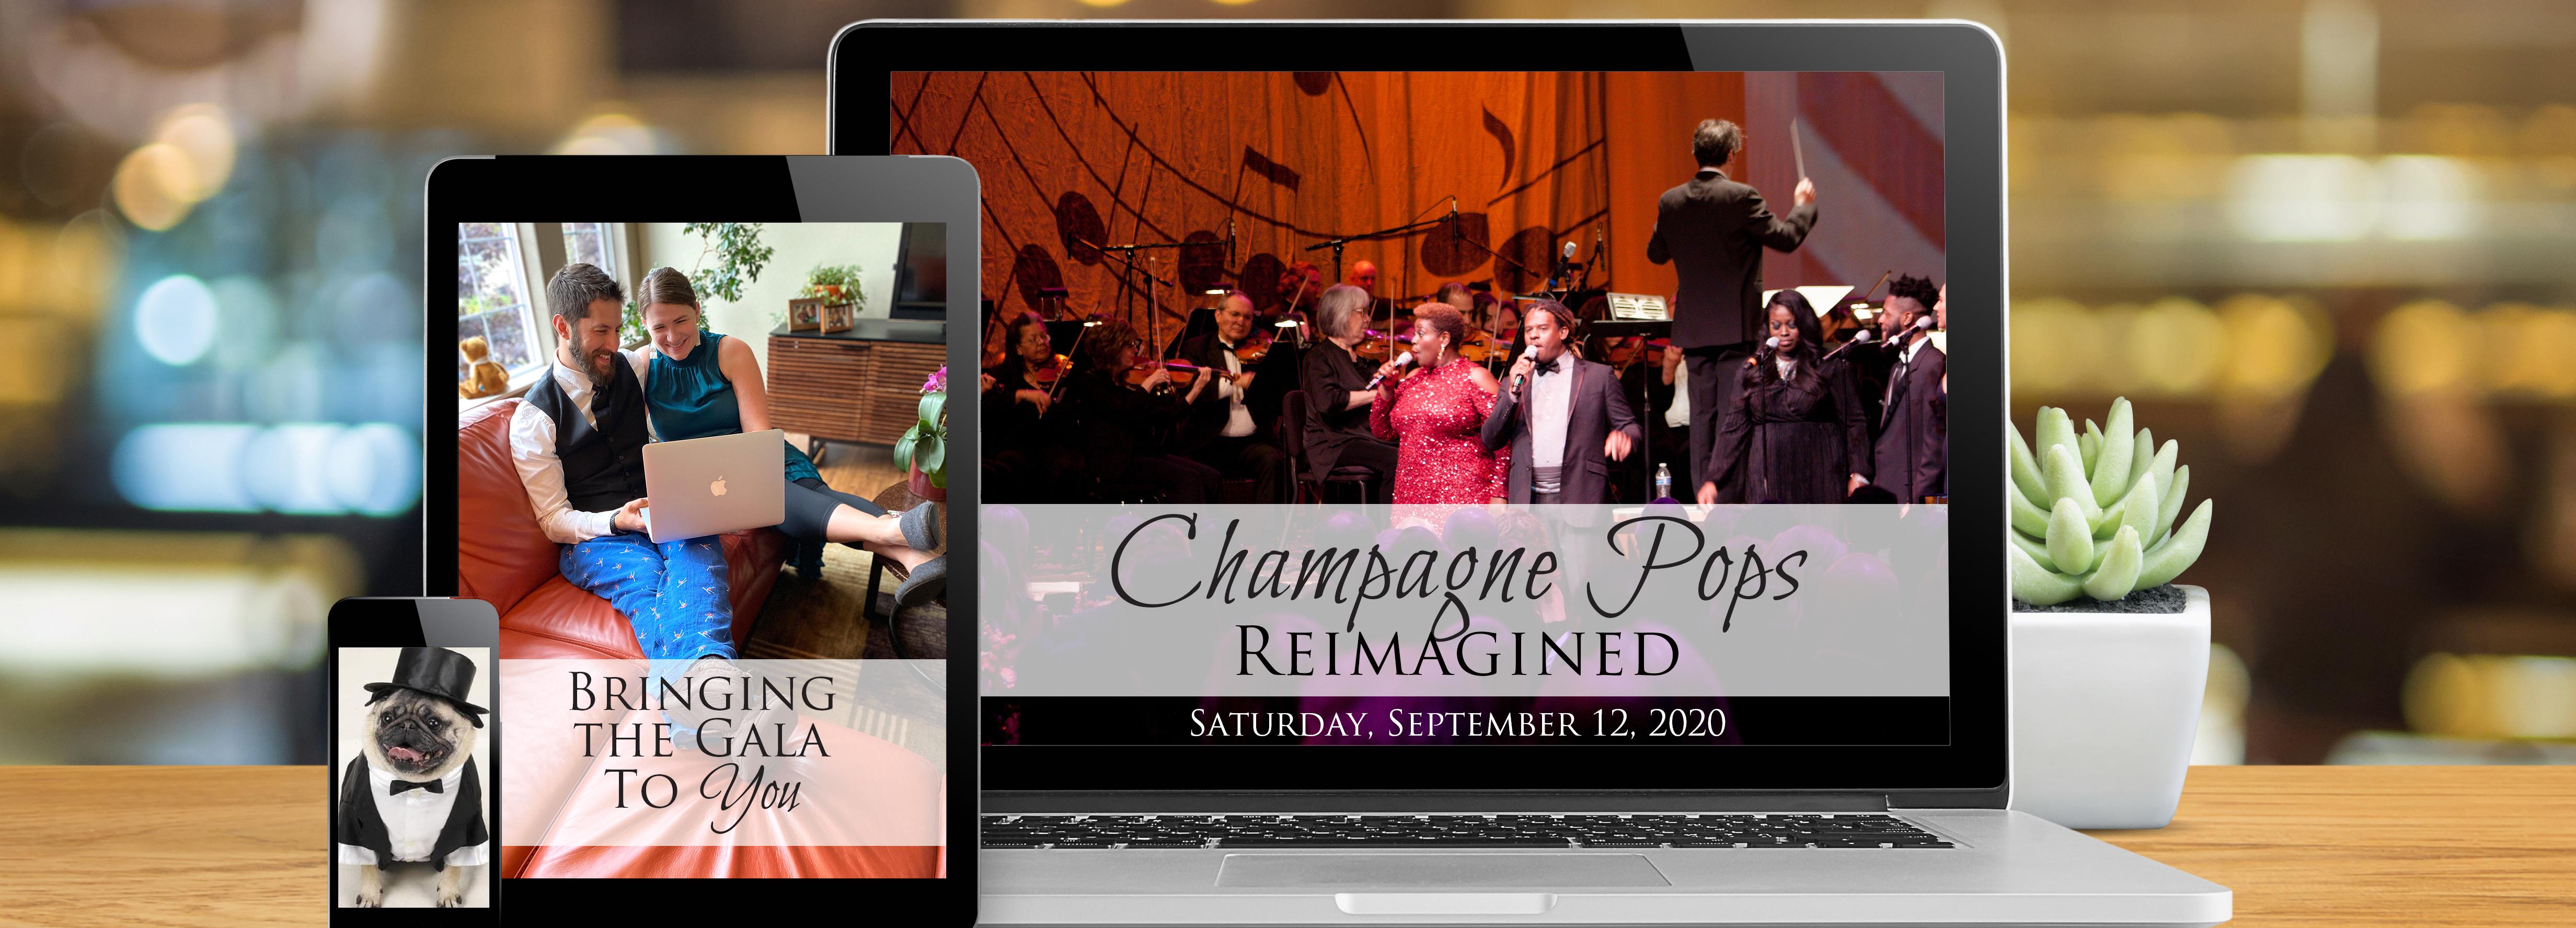 Champagne Pops